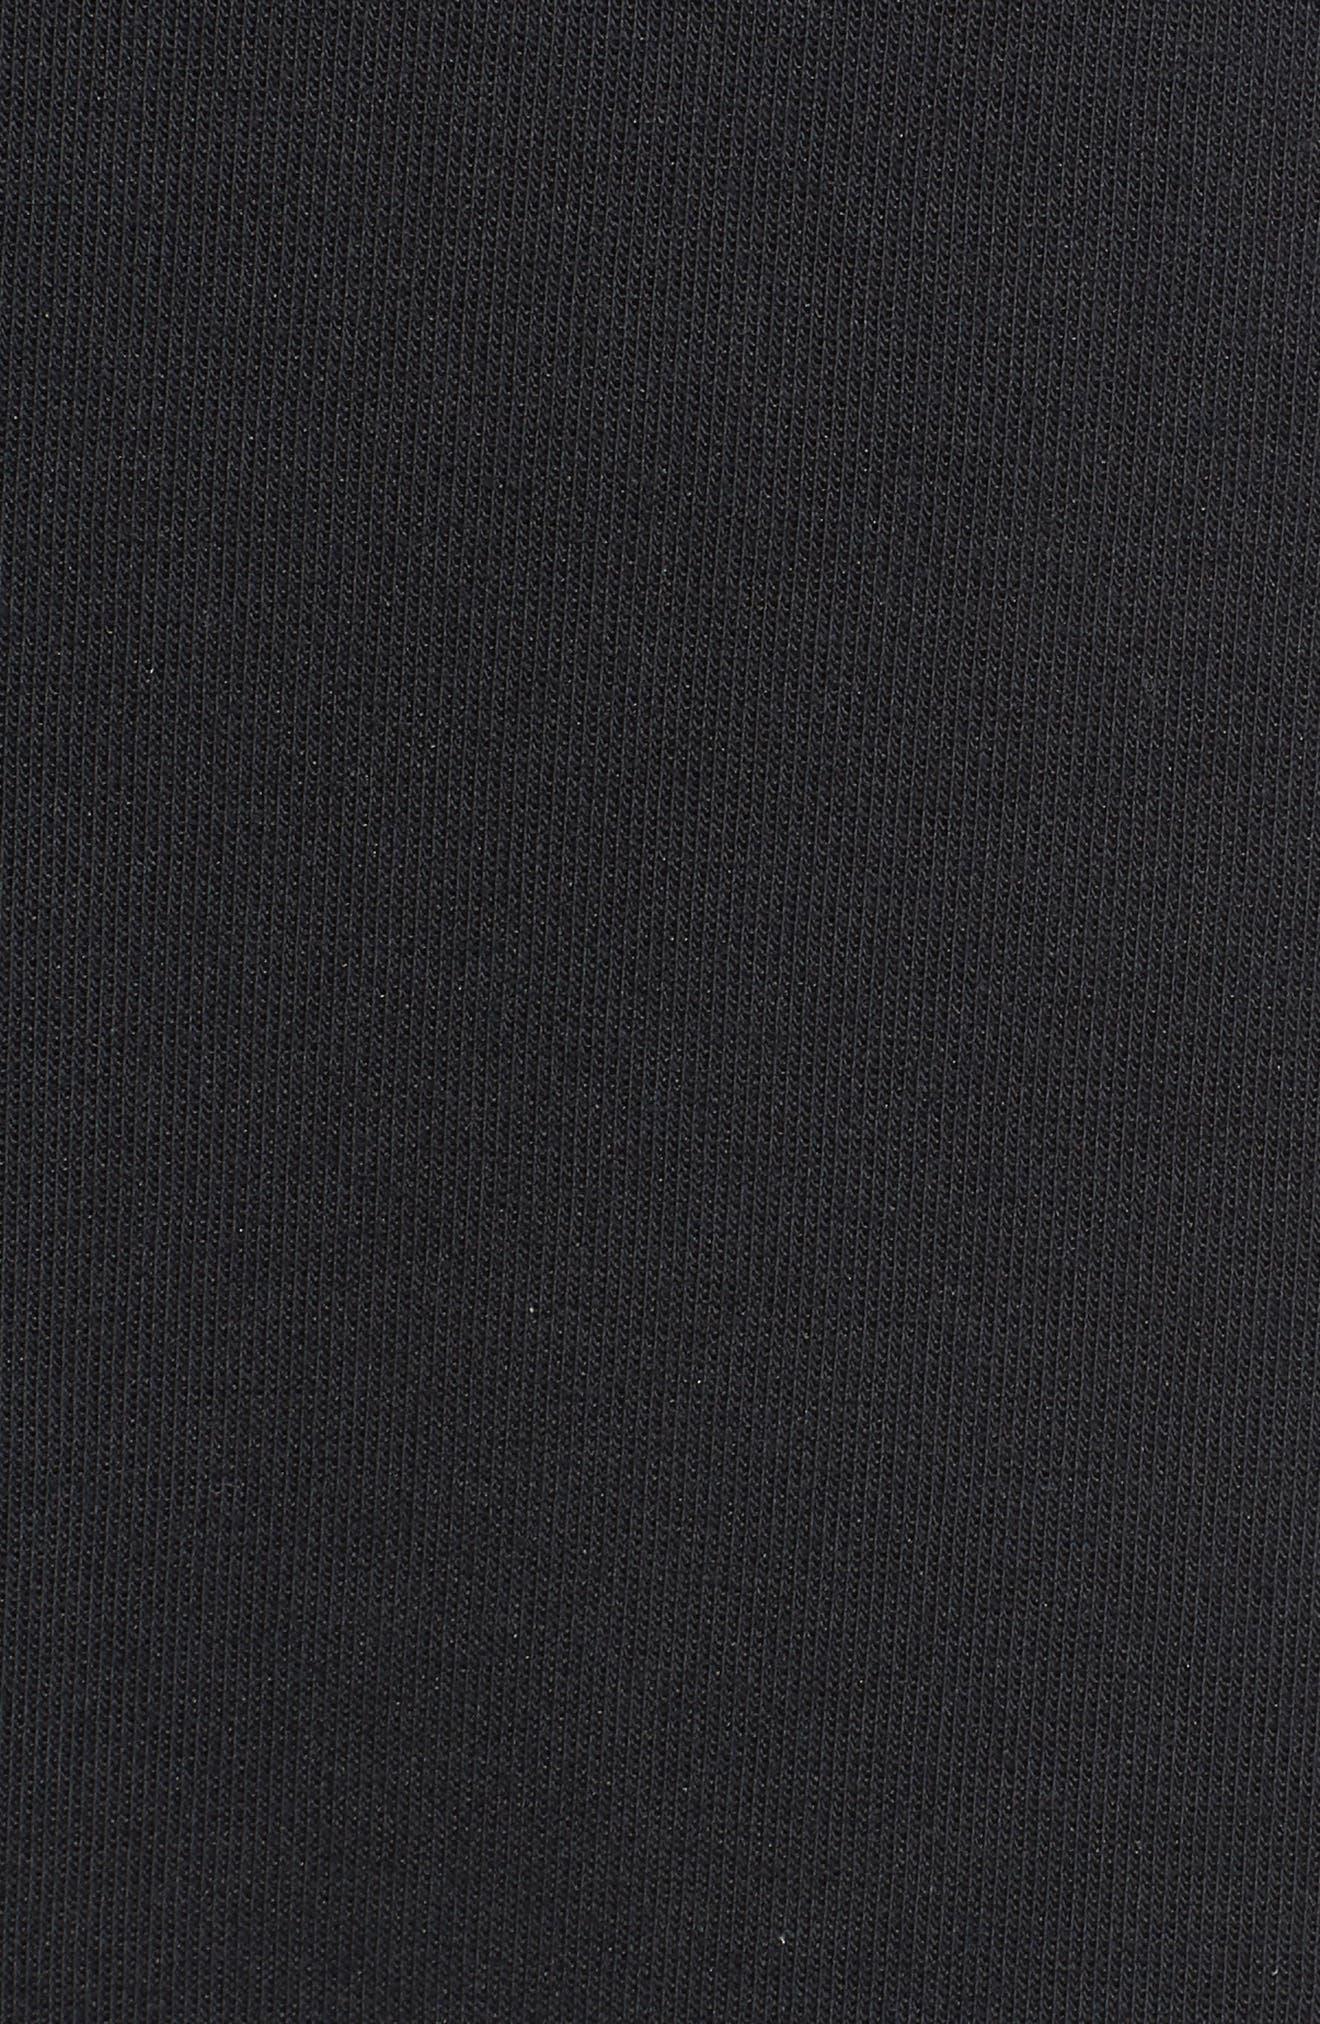 Tech Fleece Pants,                             Alternate thumbnail 5, color,                             BLACK/ BLACK